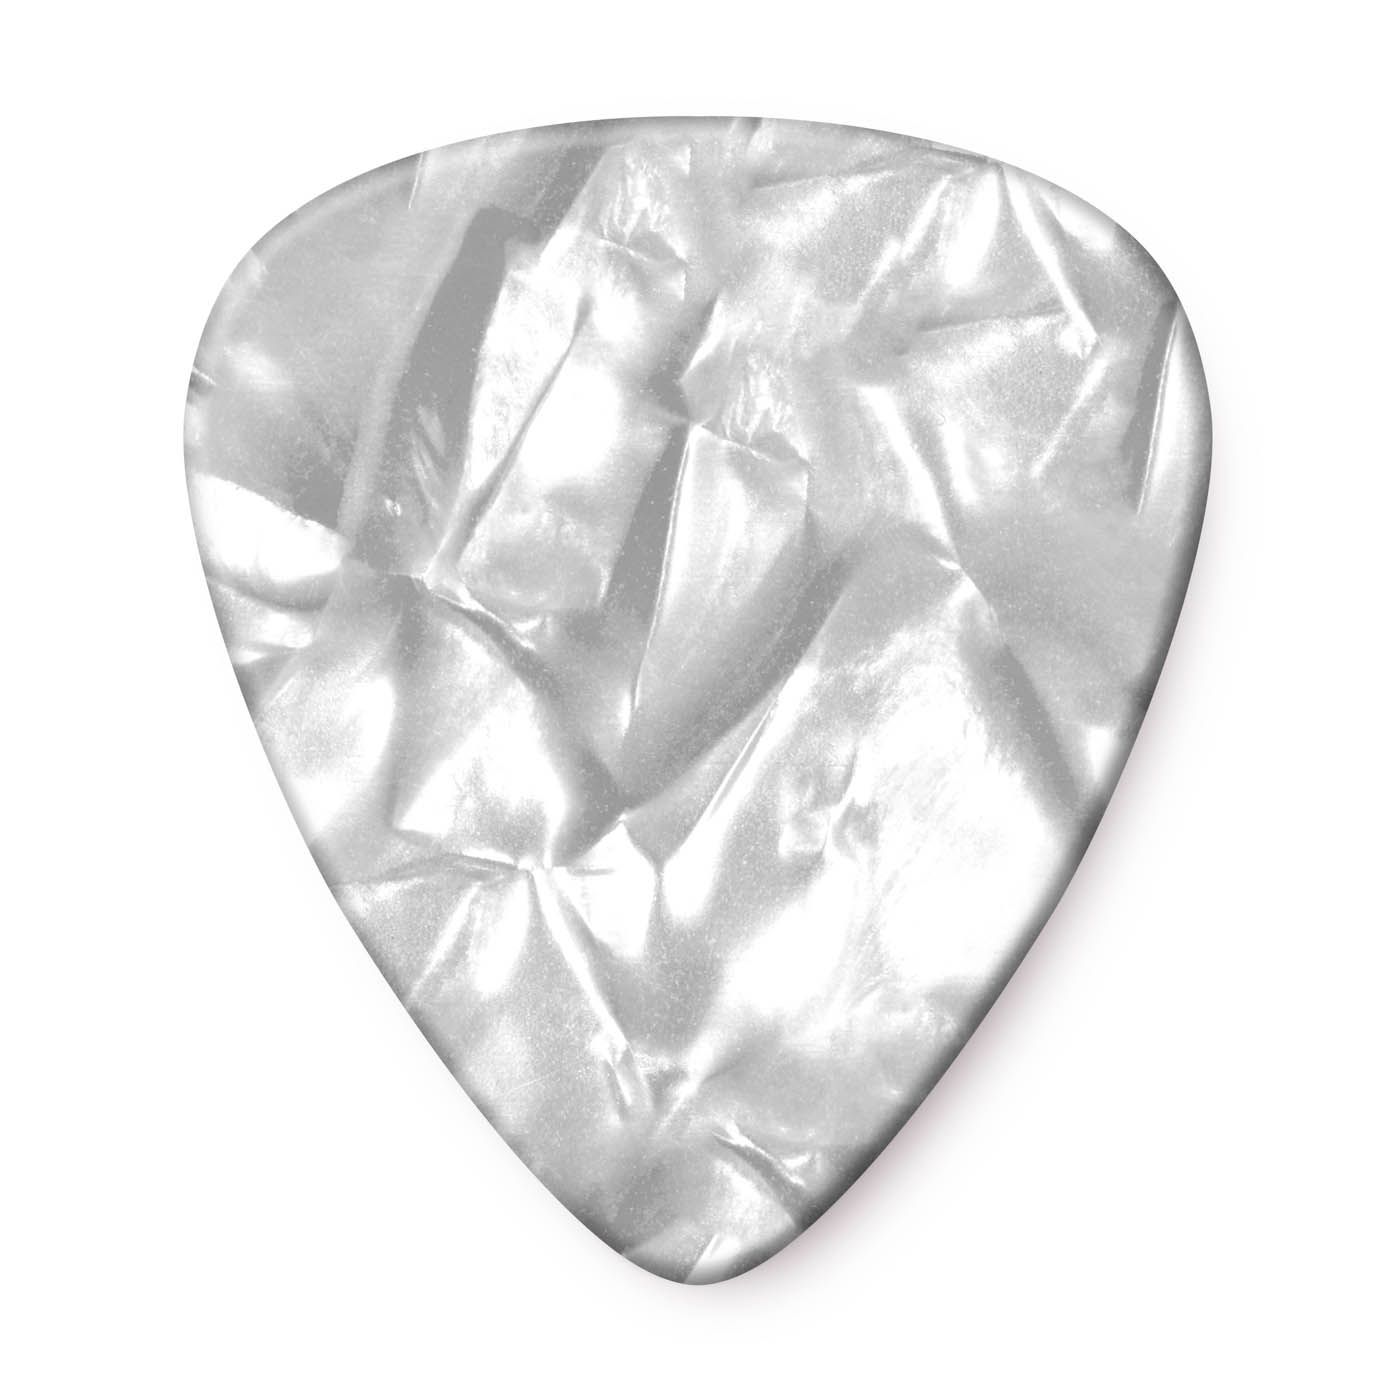 Dunlop - White Perloid extra heavy